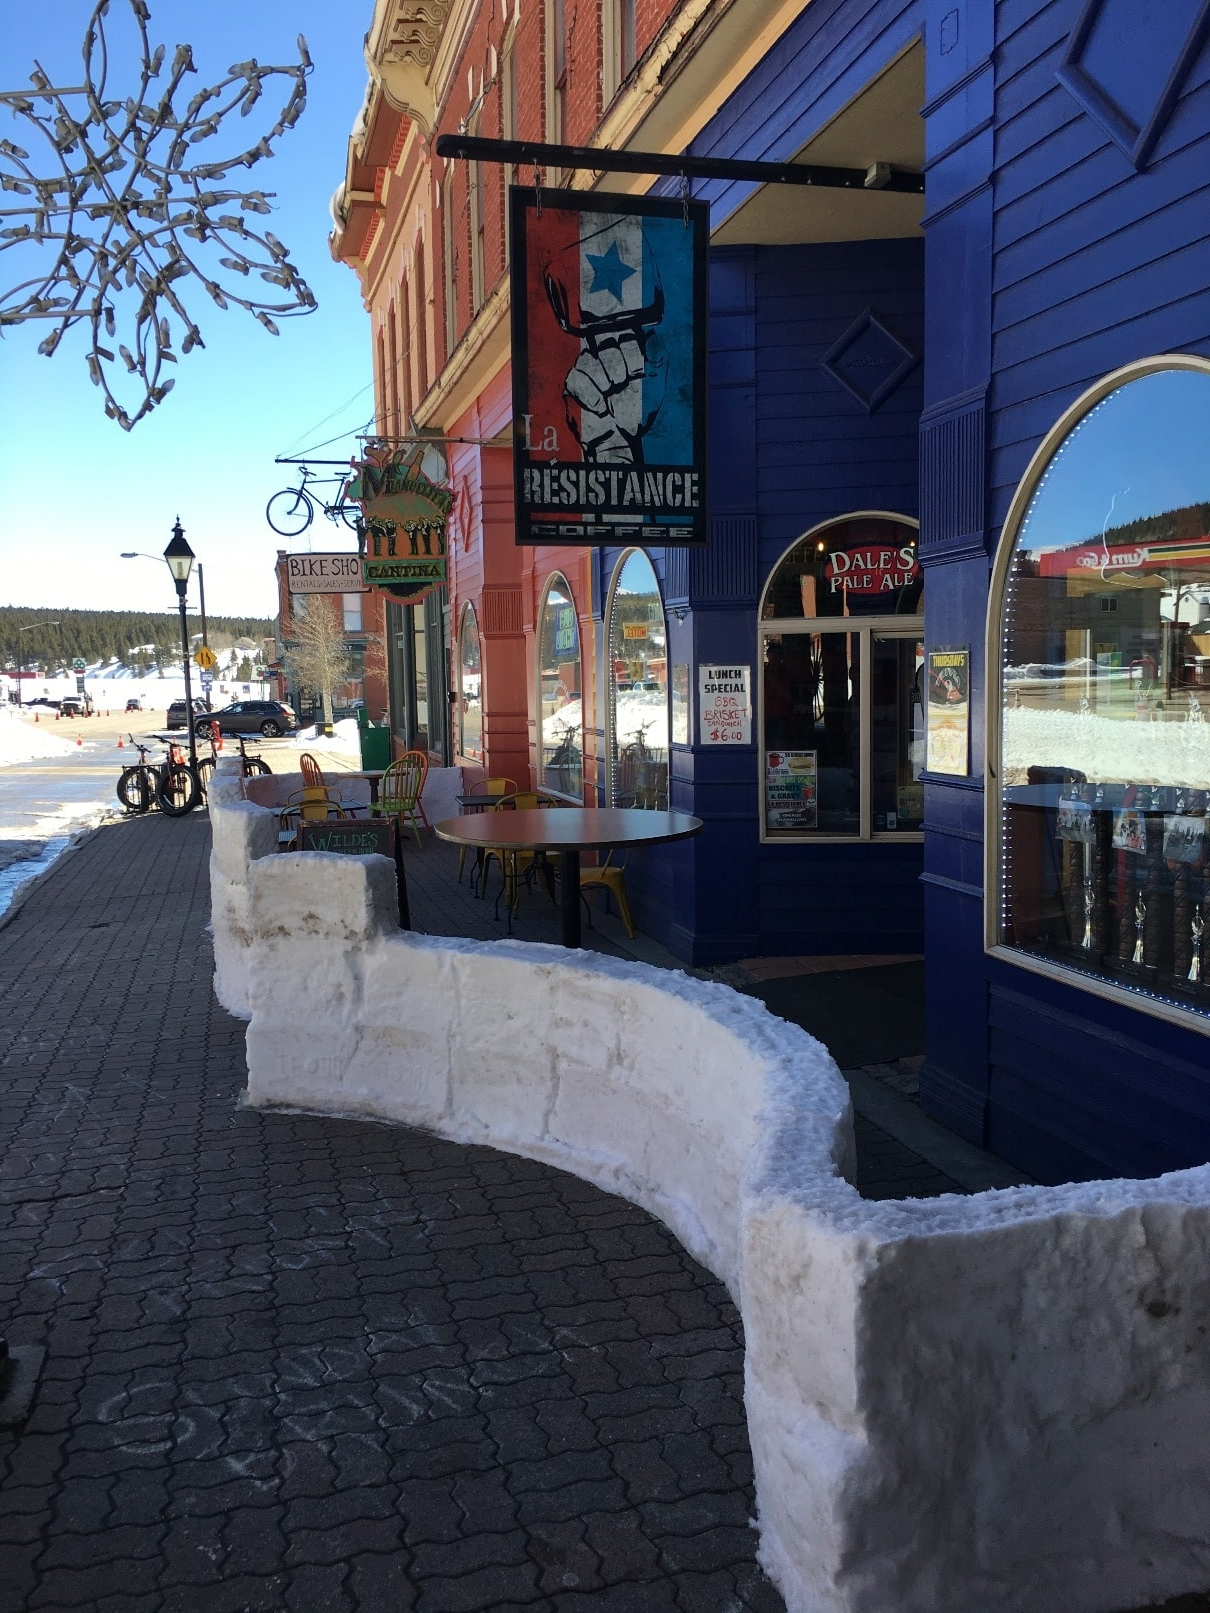 Snow fence at La Resistance Coffee Shop